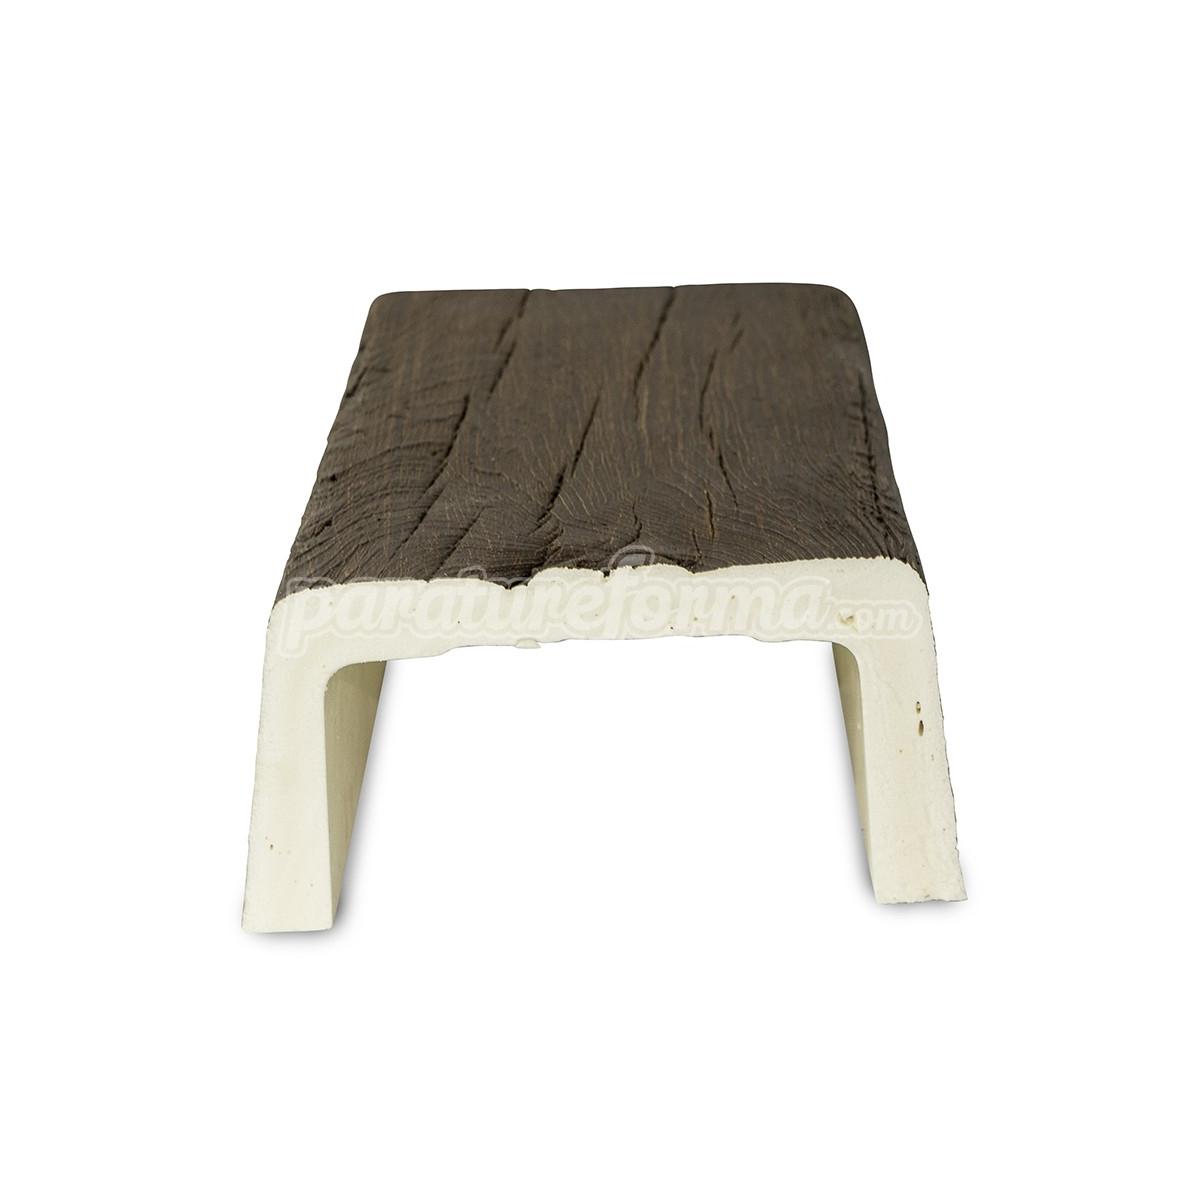 Grupo Unamacor Viga 300x14,5x8 imitación madera